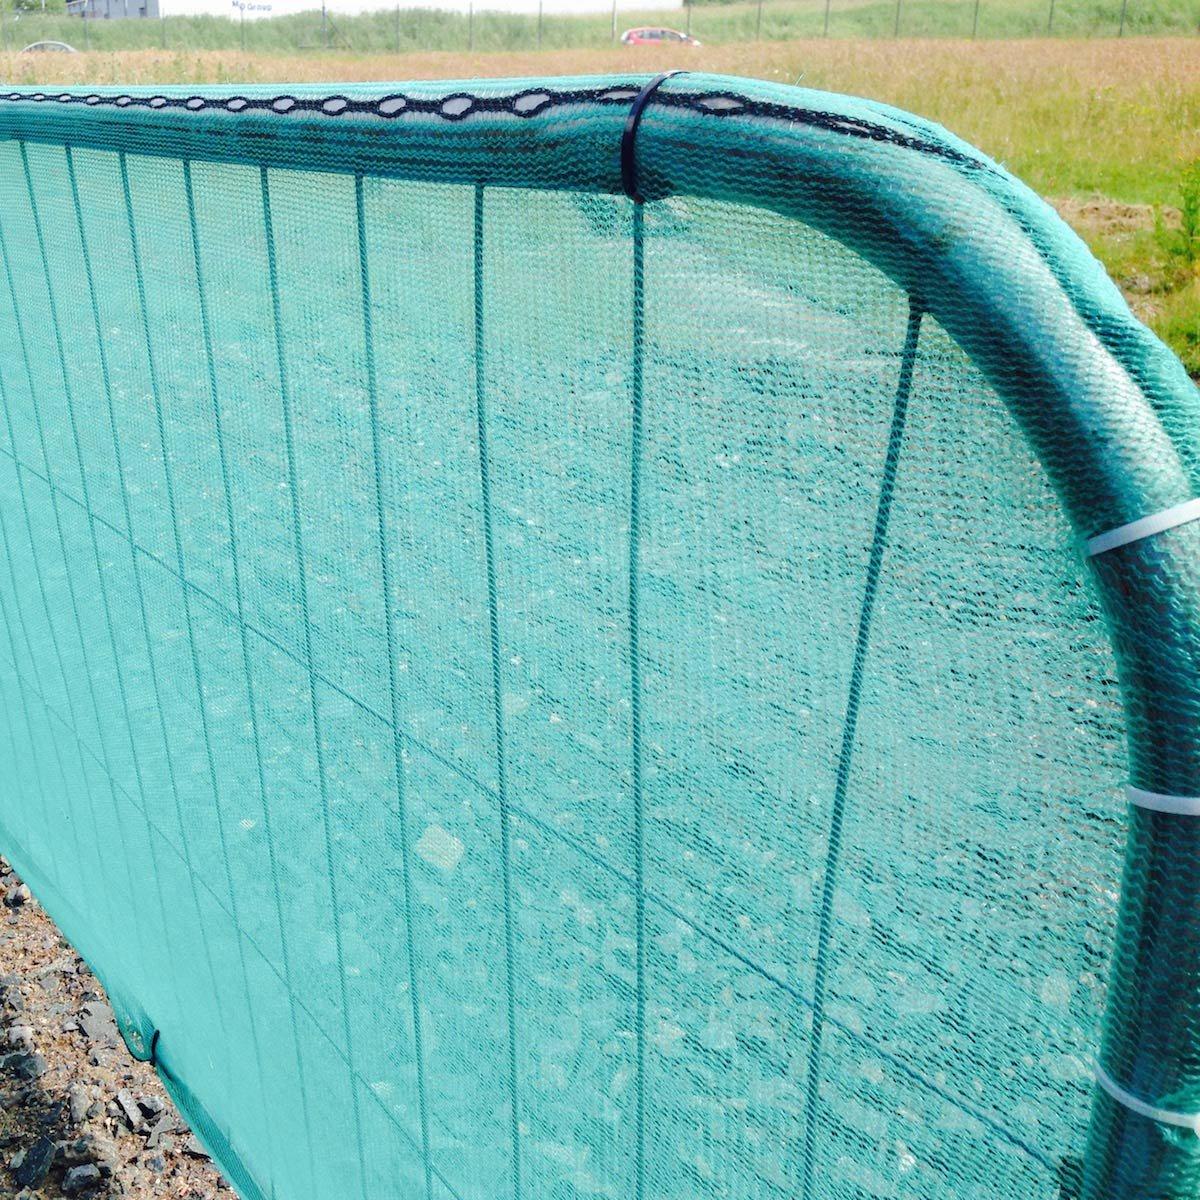 Yuzet Green Debris Netting 1m x 50m